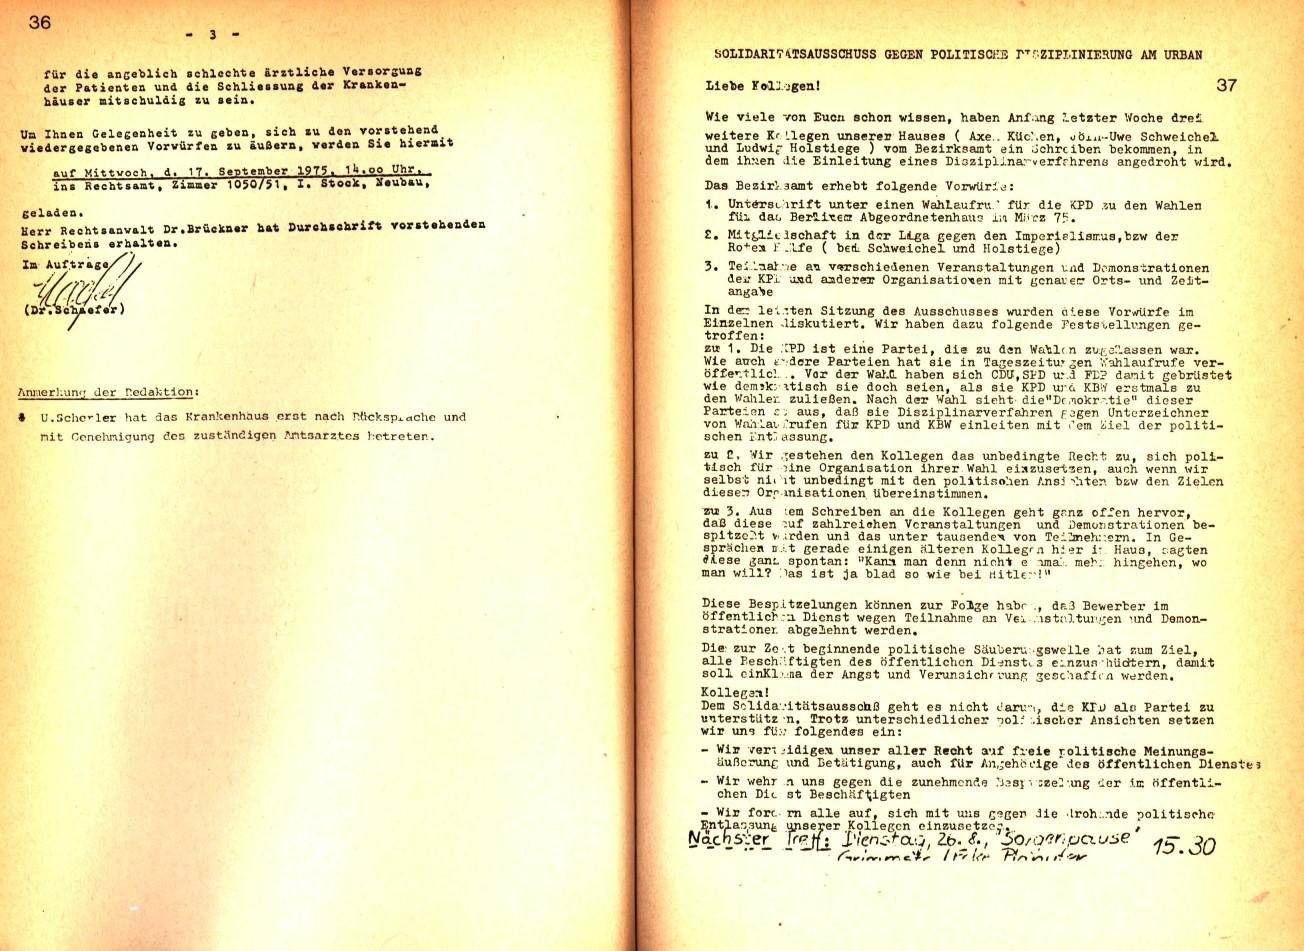 Berlin_VDS_Aktionskomitee_1975_BerufsverboteII_20